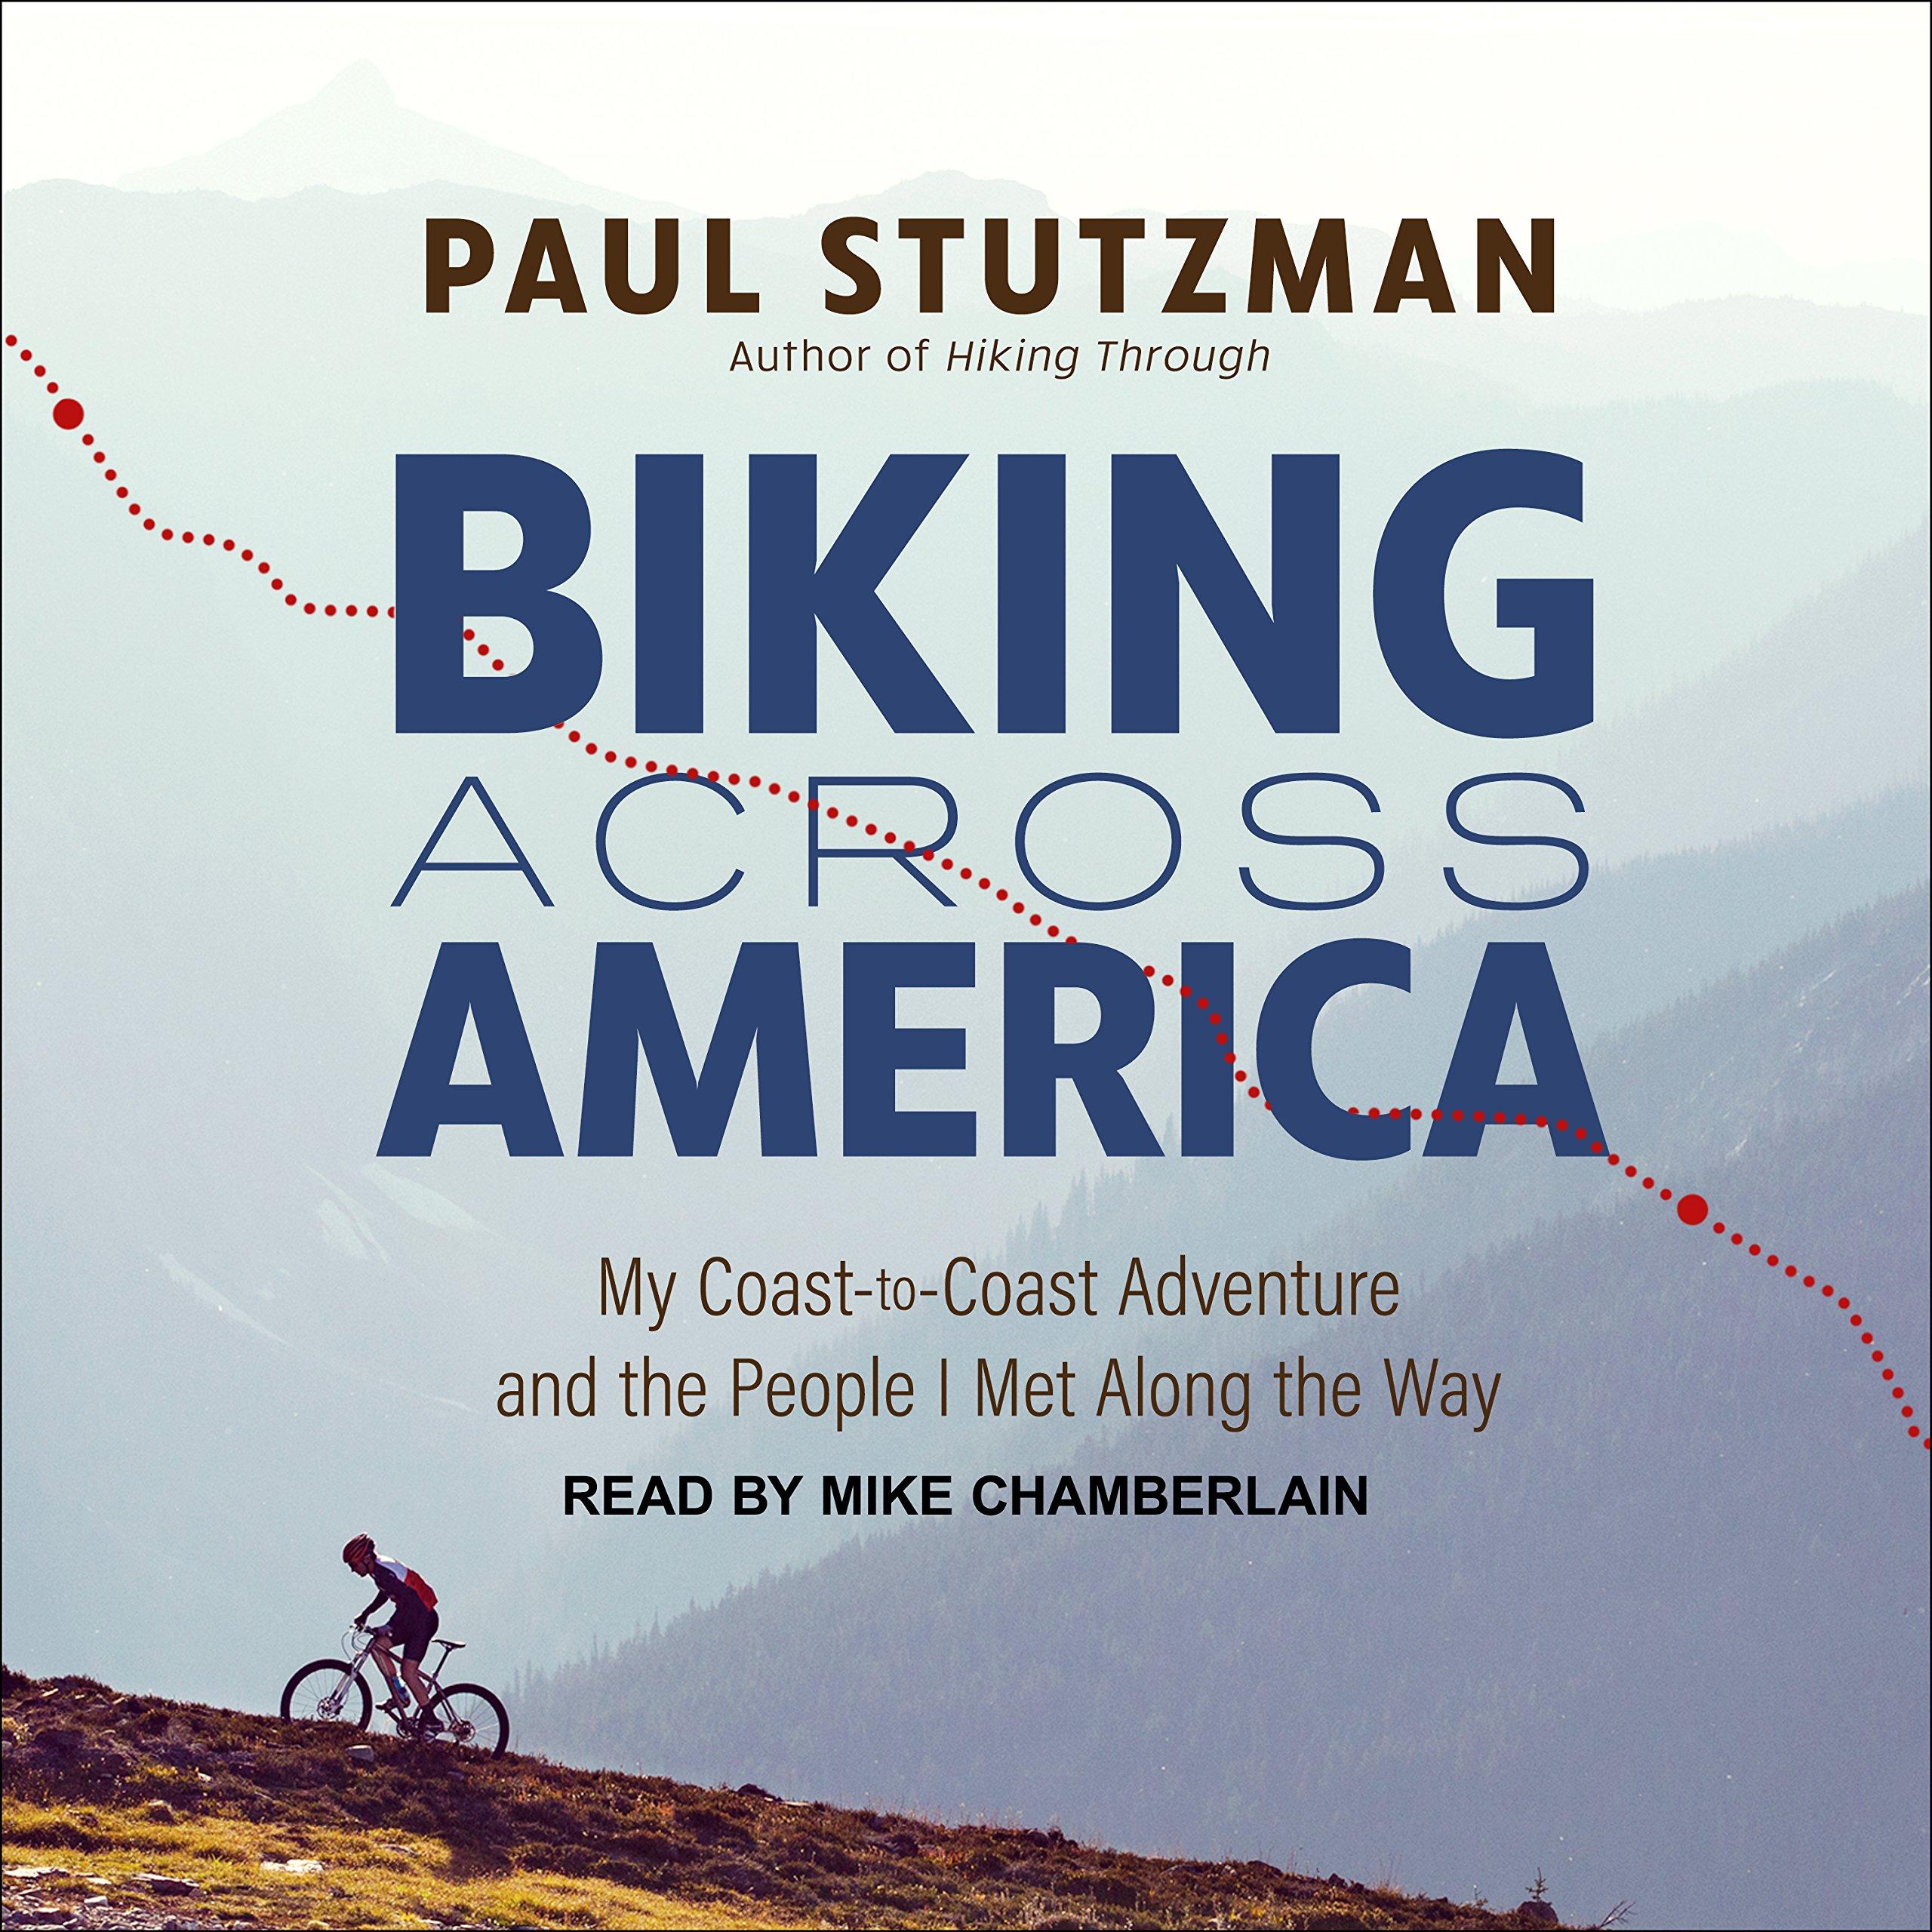 Biking Across America: My Coast-to-Coast Adventure and the People I Met Along the Way